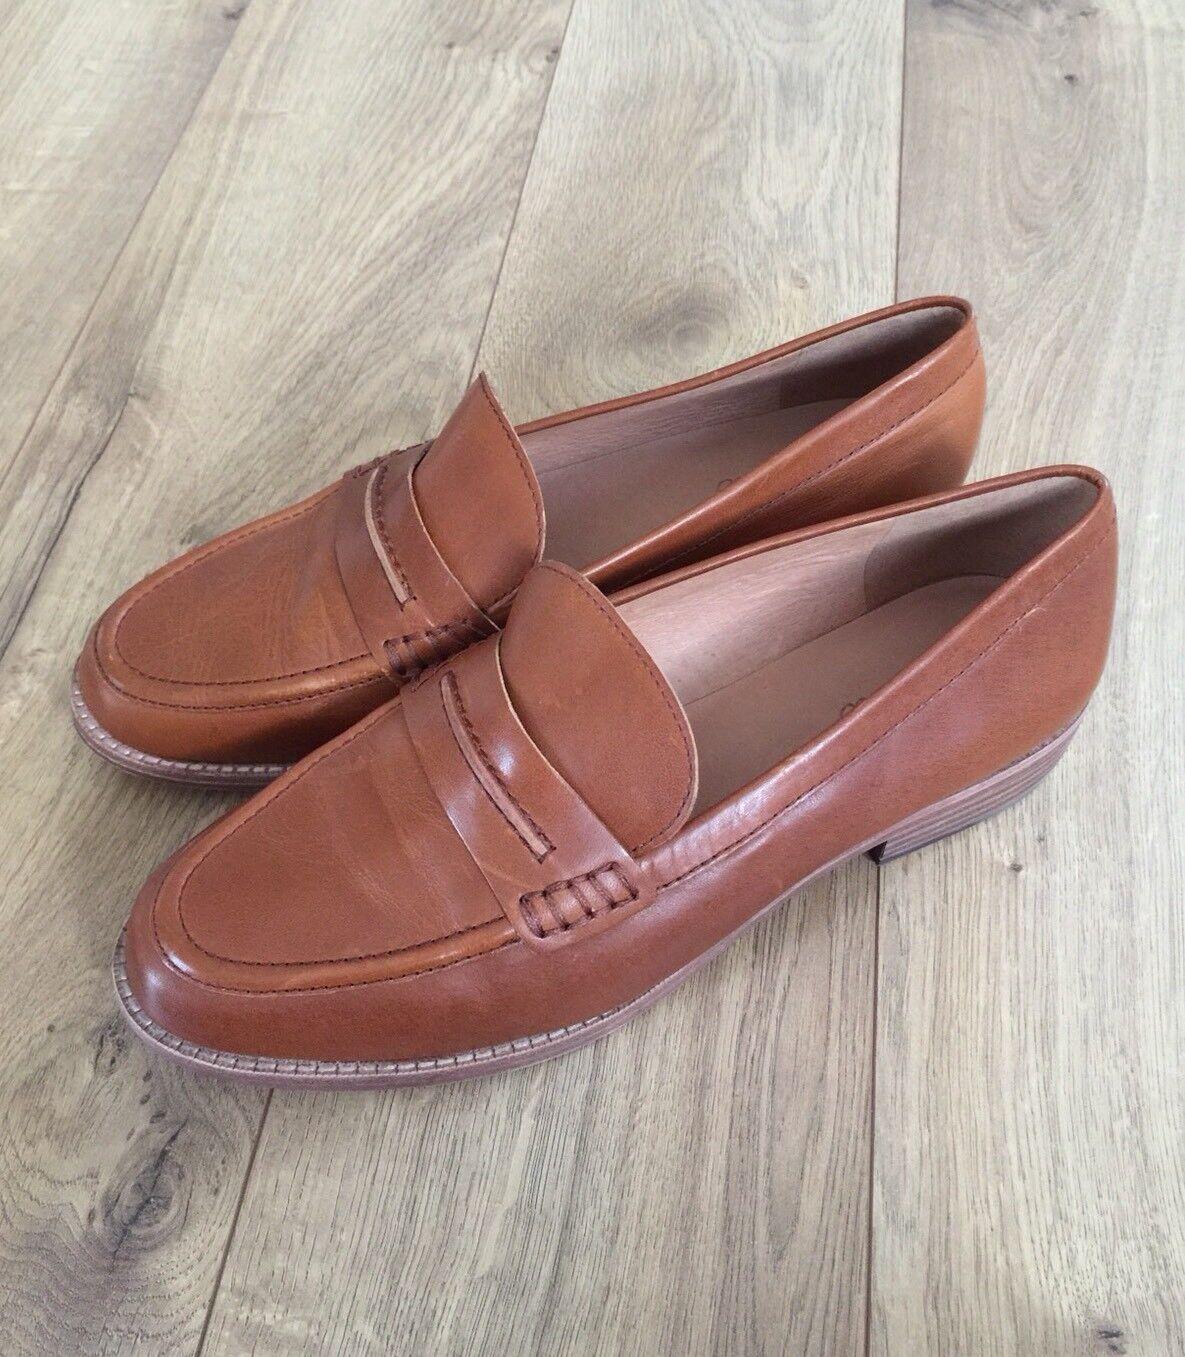 New Madewell The Elinor Loafer in Sz Leder Dark Chestnut Sz in 11 F5096 f0de83